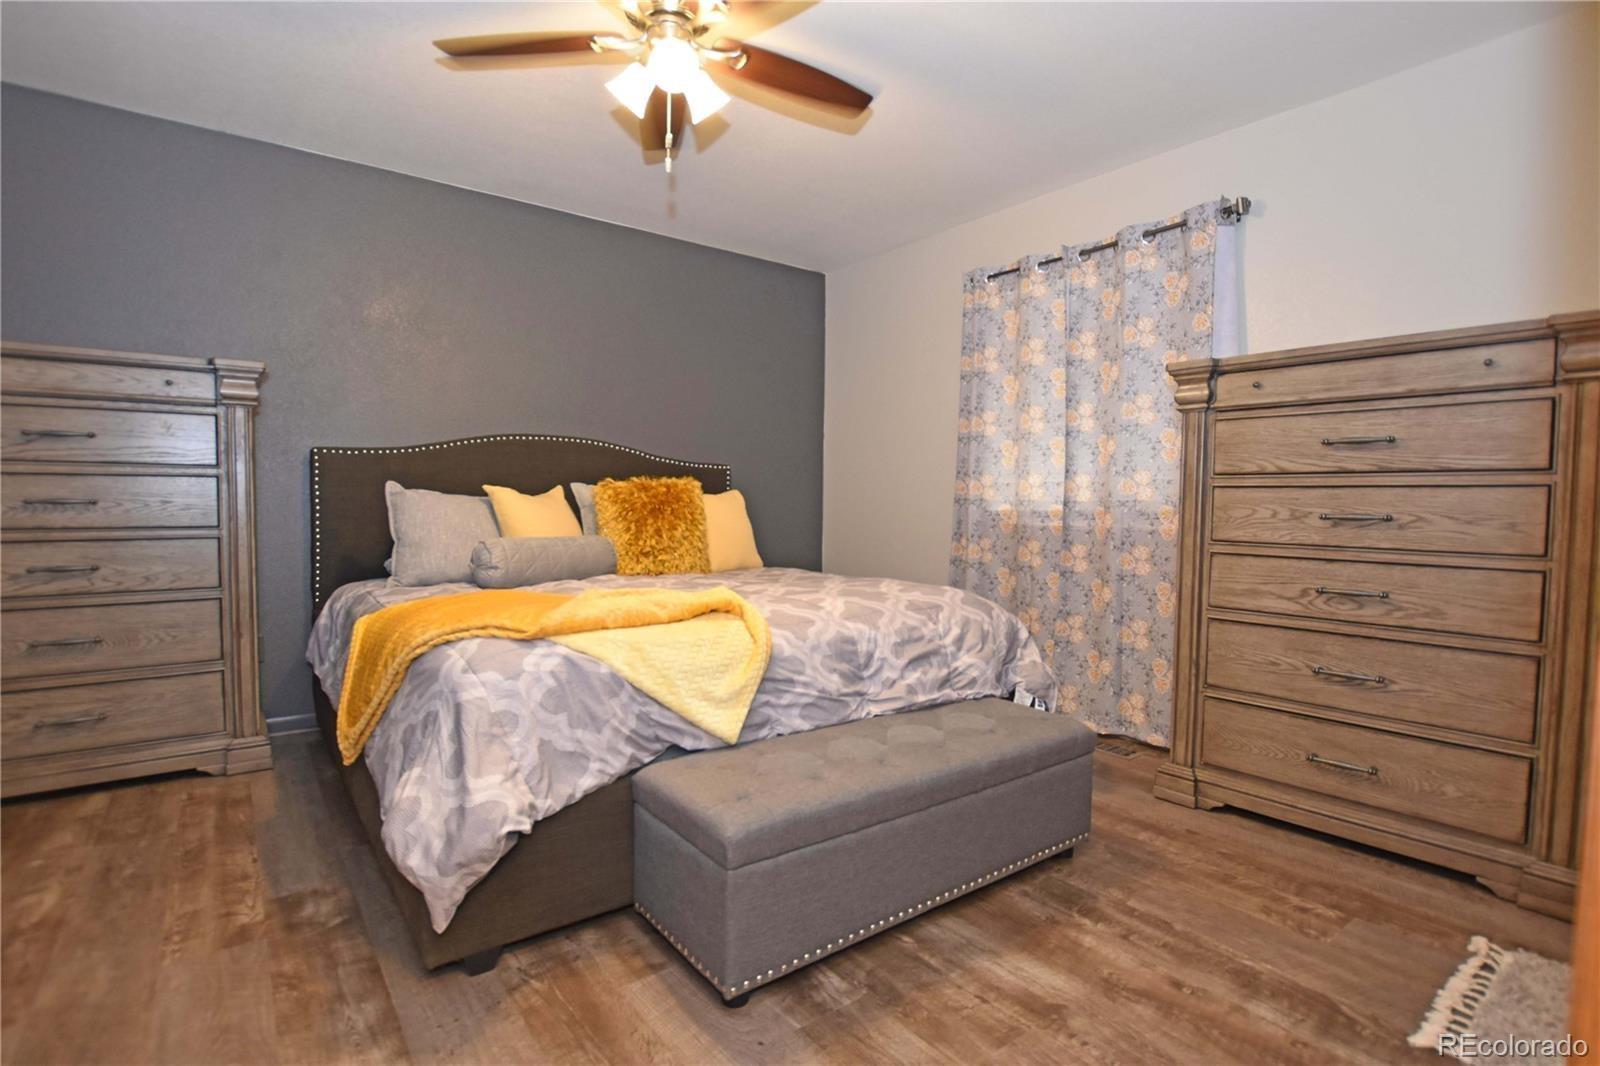 MLS# 9206879 - 21 - 3924 Eagles Nest Drive, Evans, CO 80620